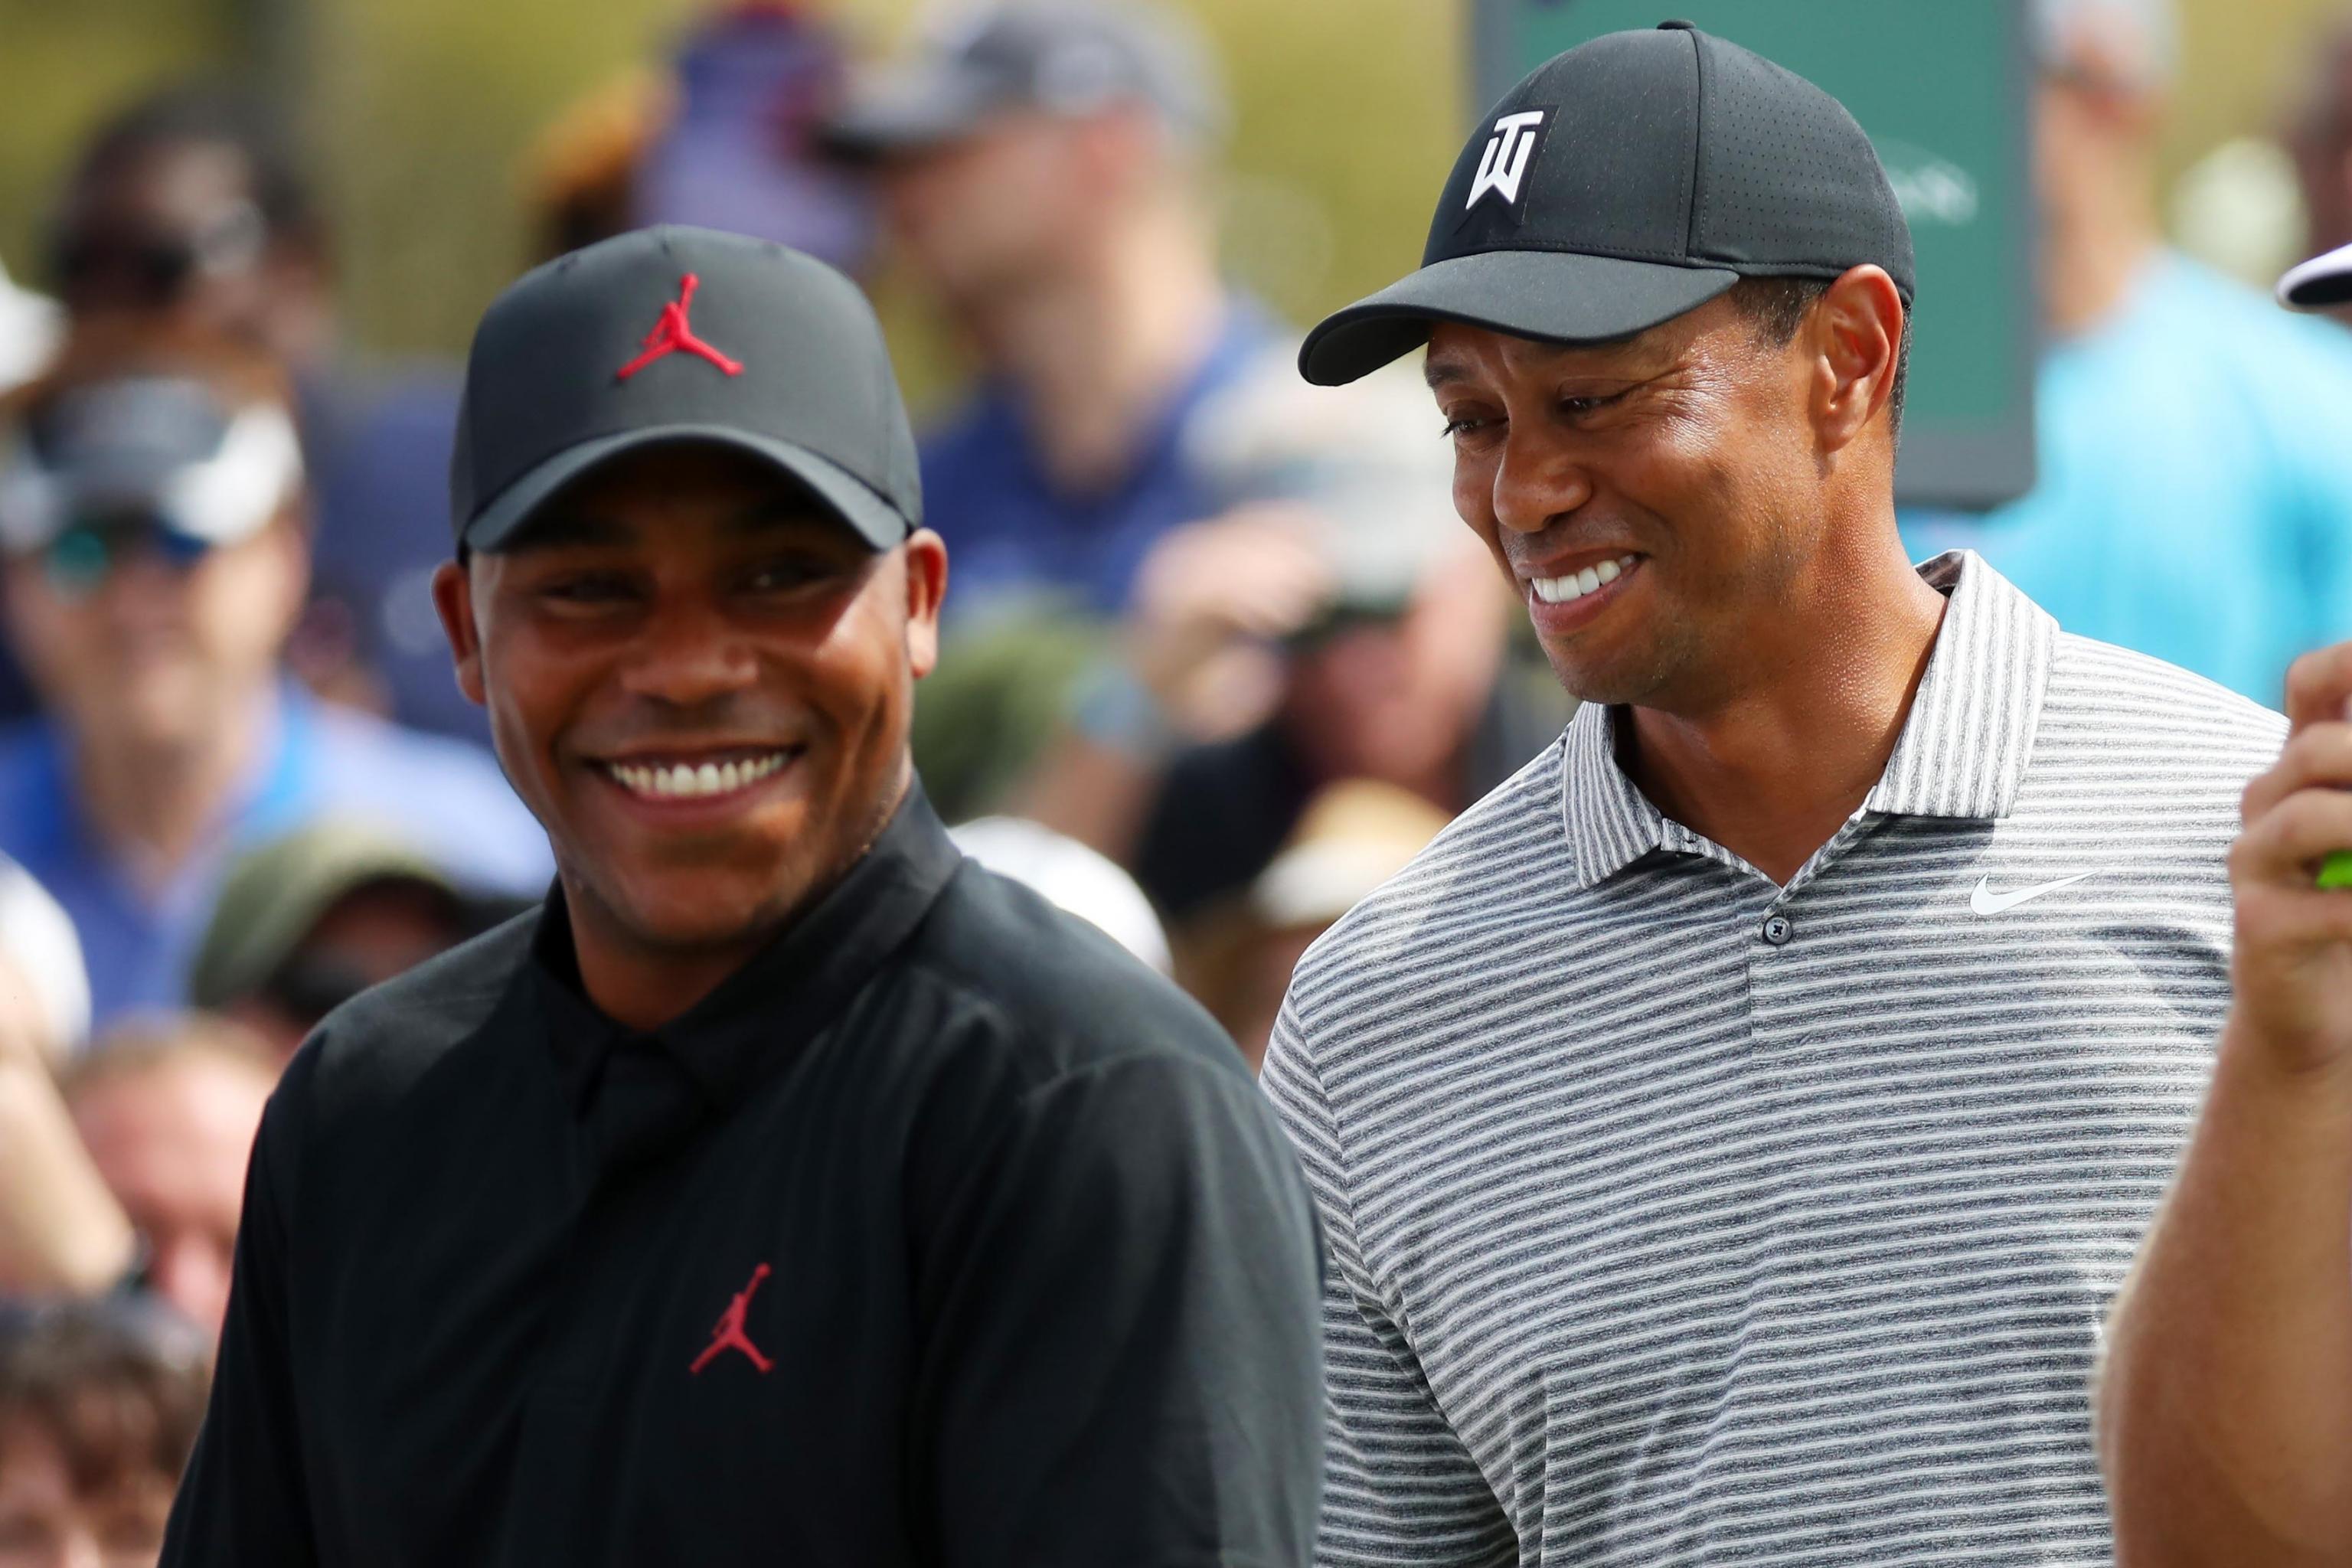 Tiger Woods Tip-Toes On Social Injustice, Harold Varner III Shows Deep Thought